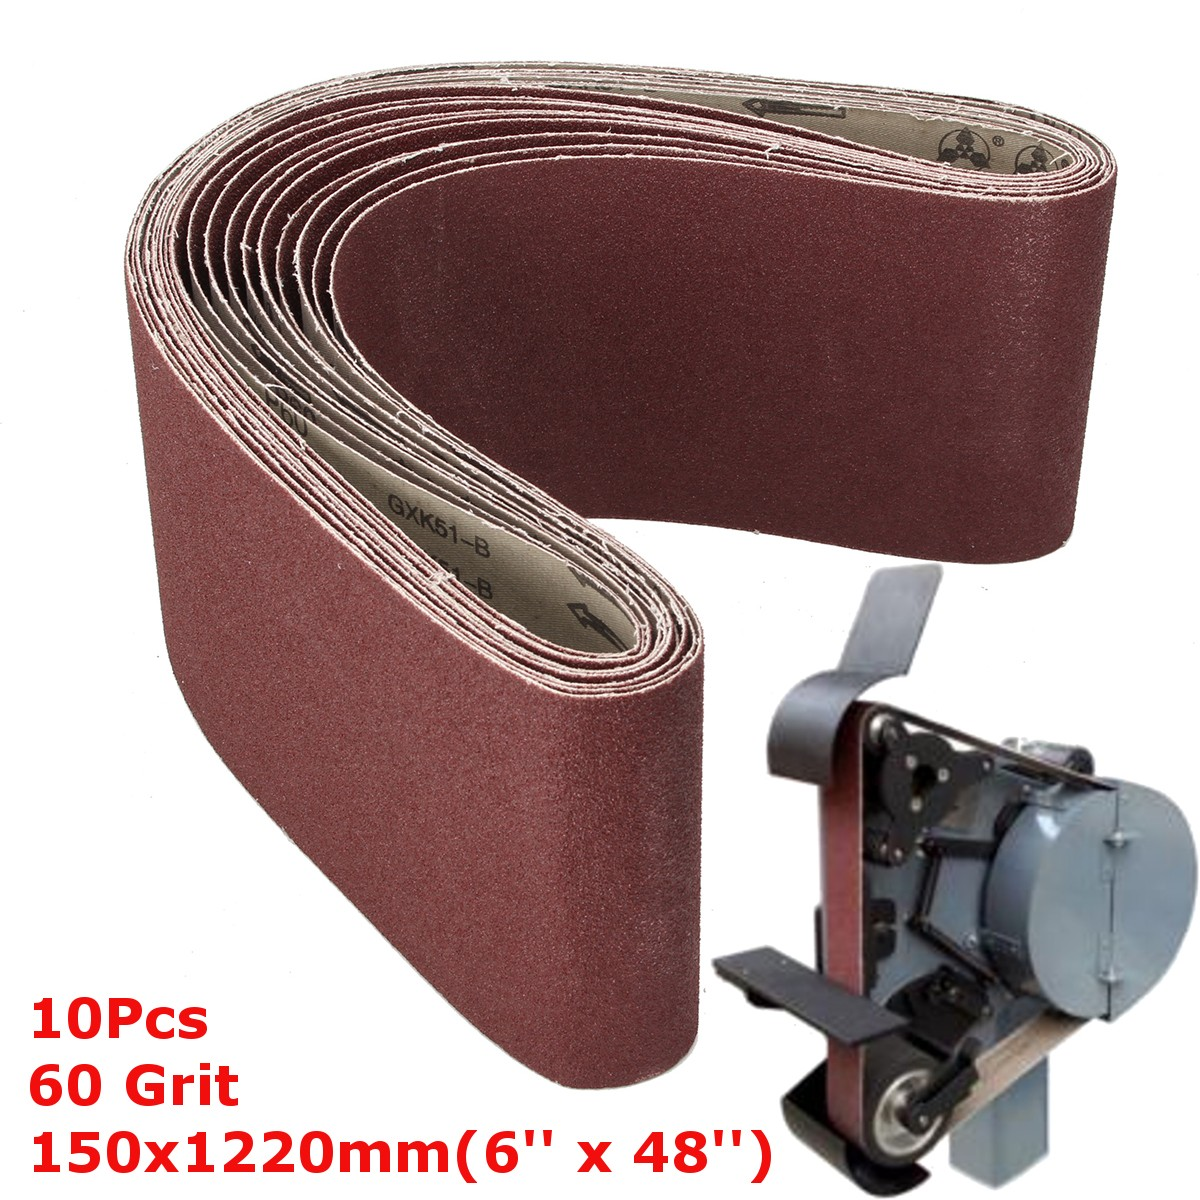 WNJ-Tools 10 Piezas 50x1220mm A//S abrasivo Bandas abrasivas 2* 48 P40-1000 Grueso a Fino Lijado con Cinta Amoladora Accesorios Grit : 40